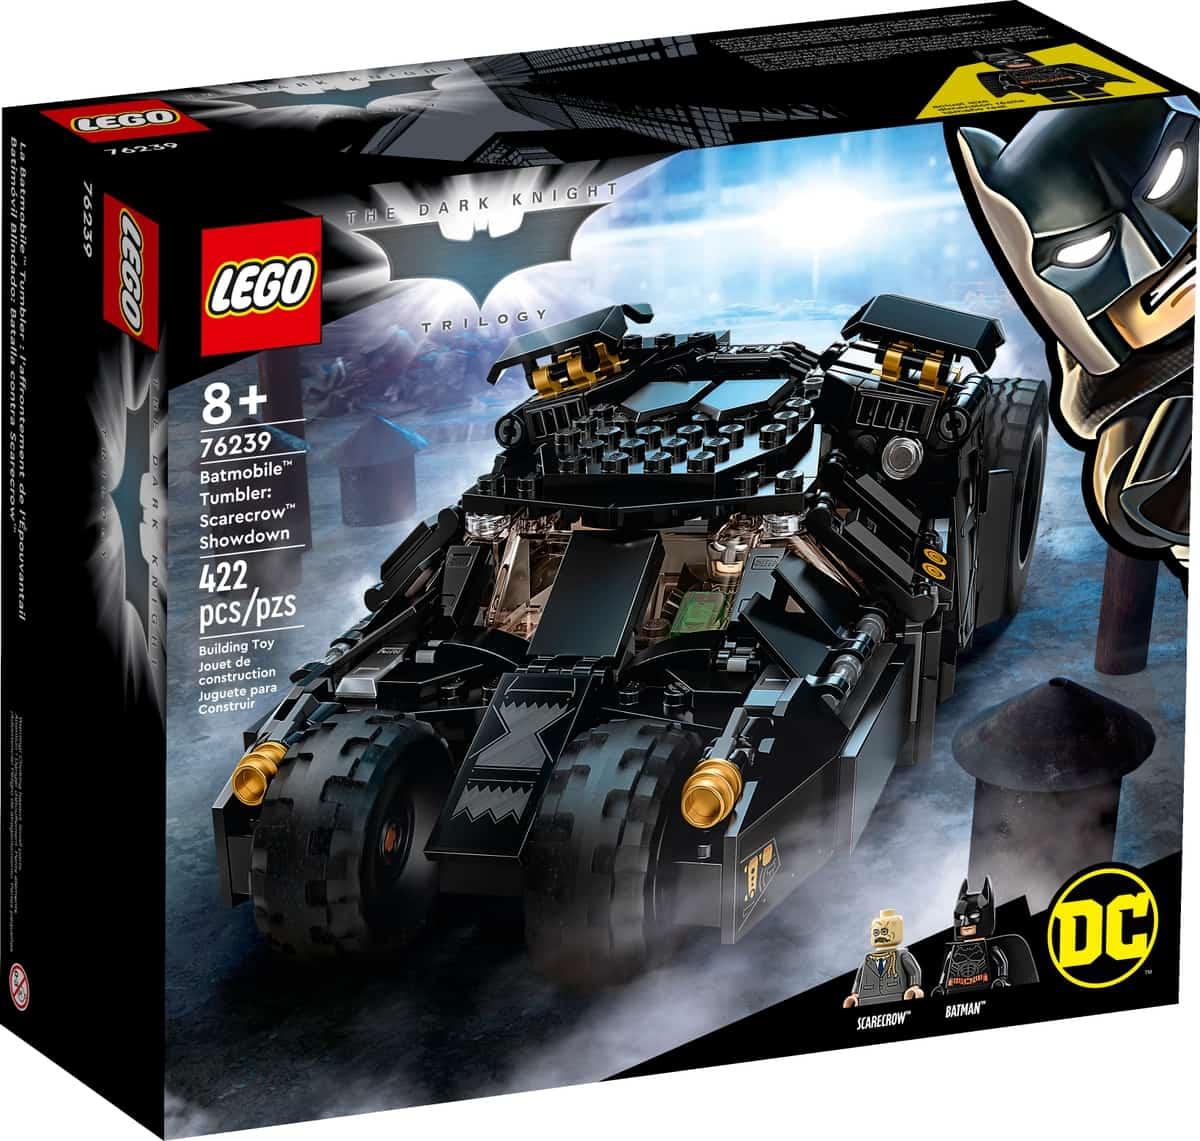 lego 76239 dc batman batmobile tumbler scarecrow krachtmeting